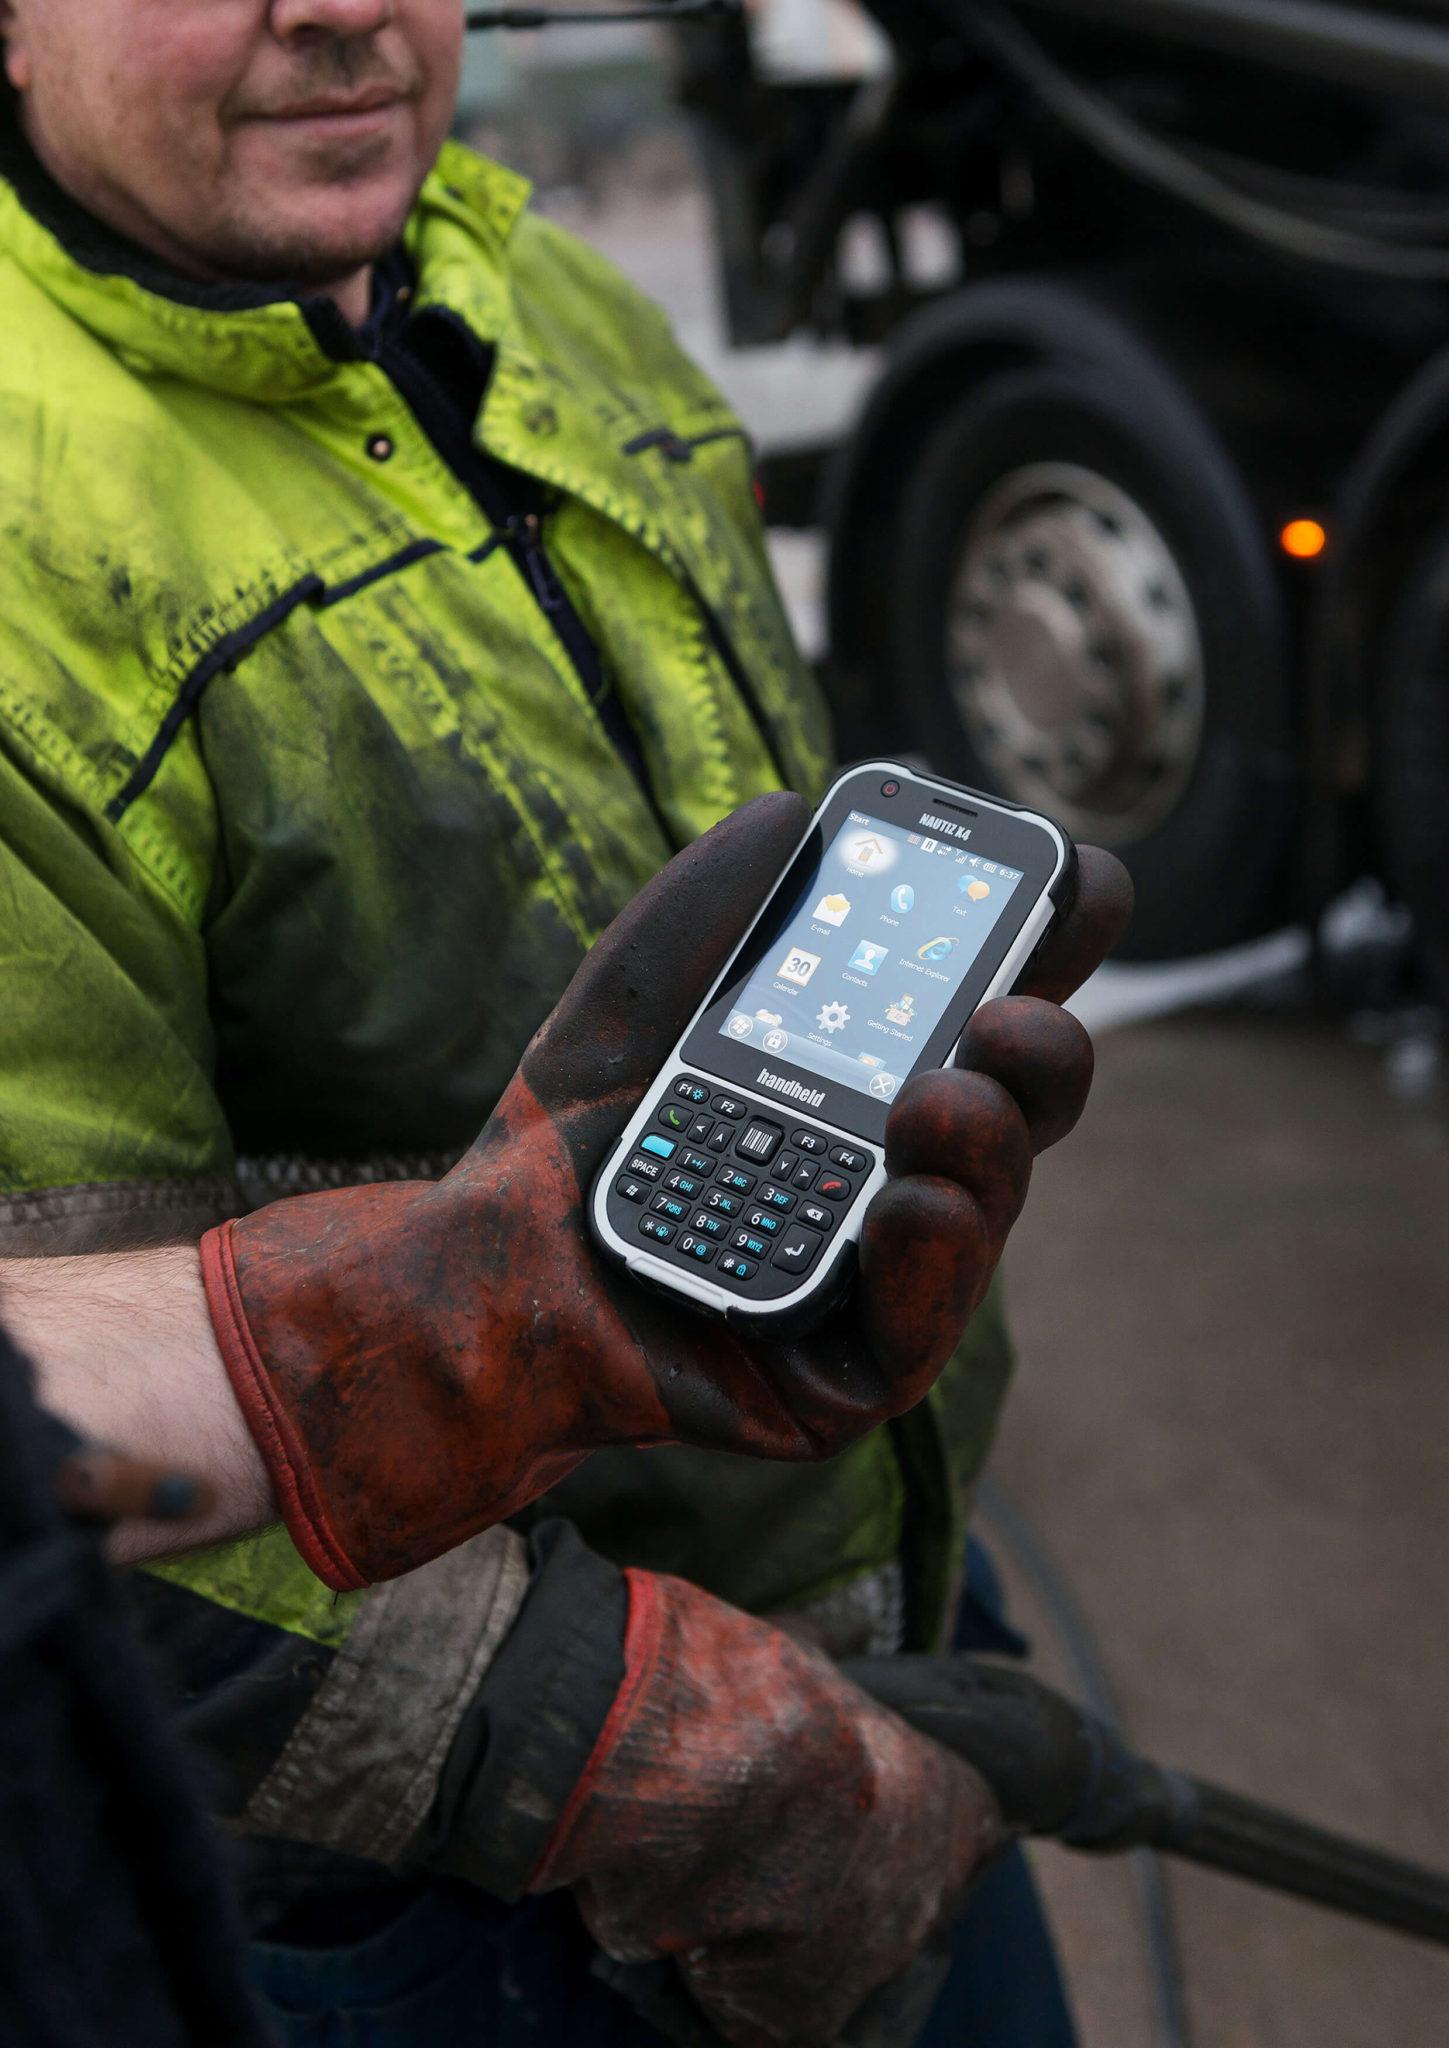 nautiz-x4-handheld-rugged-ip65-outdoor-fieldwork